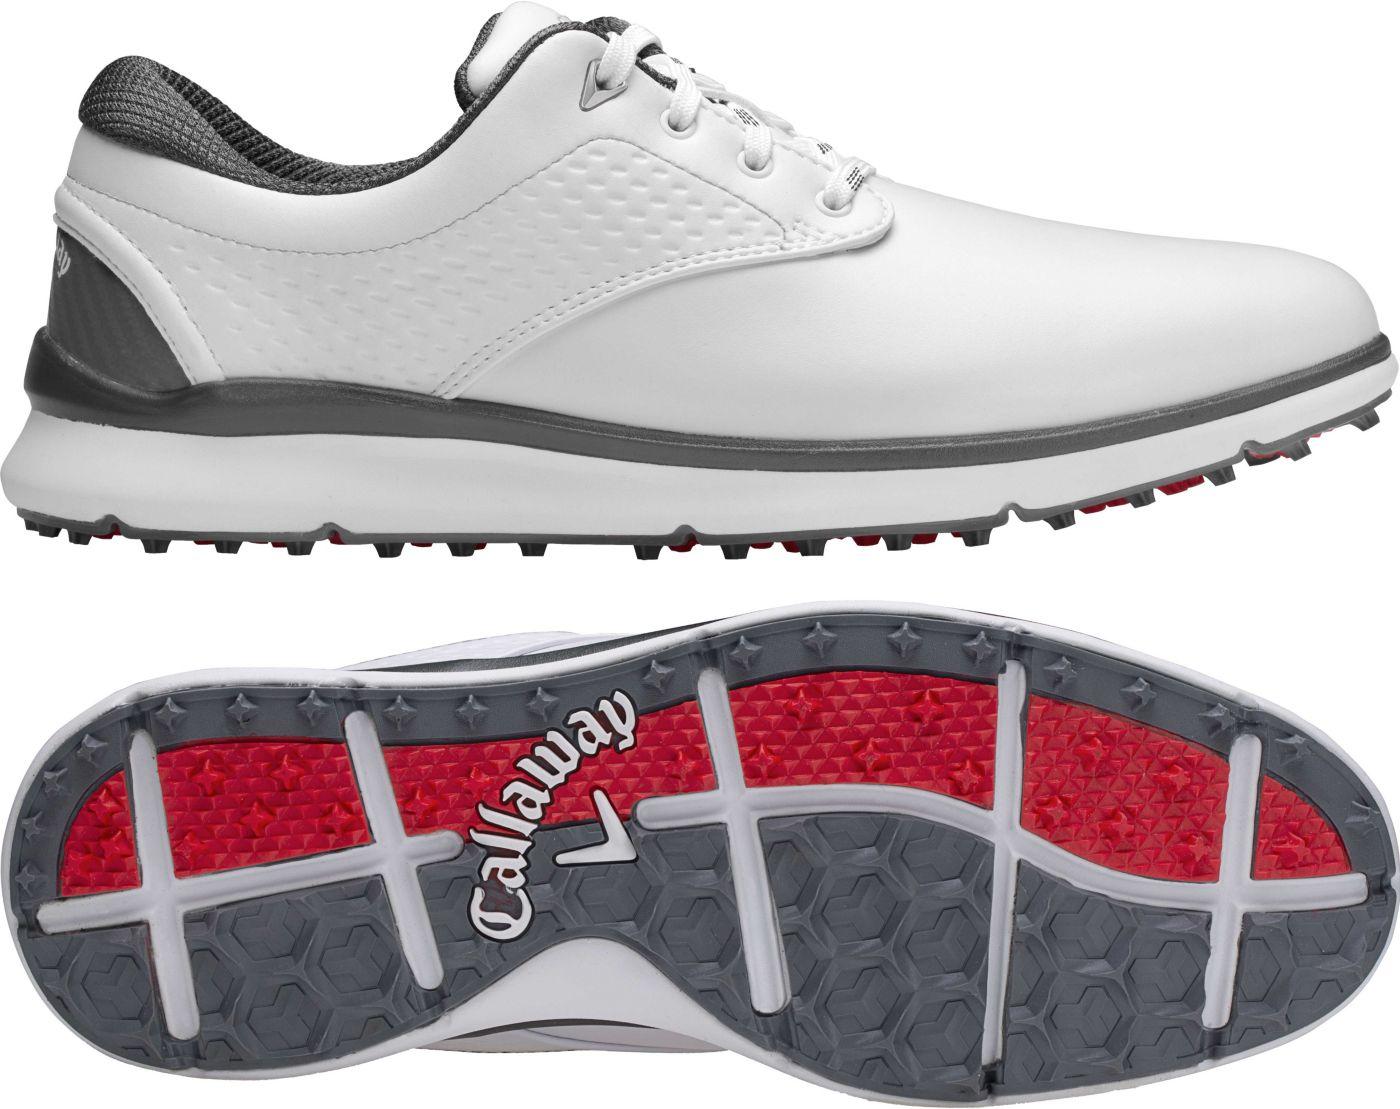 Callaway Men's Oceanside LX Golf Shoes